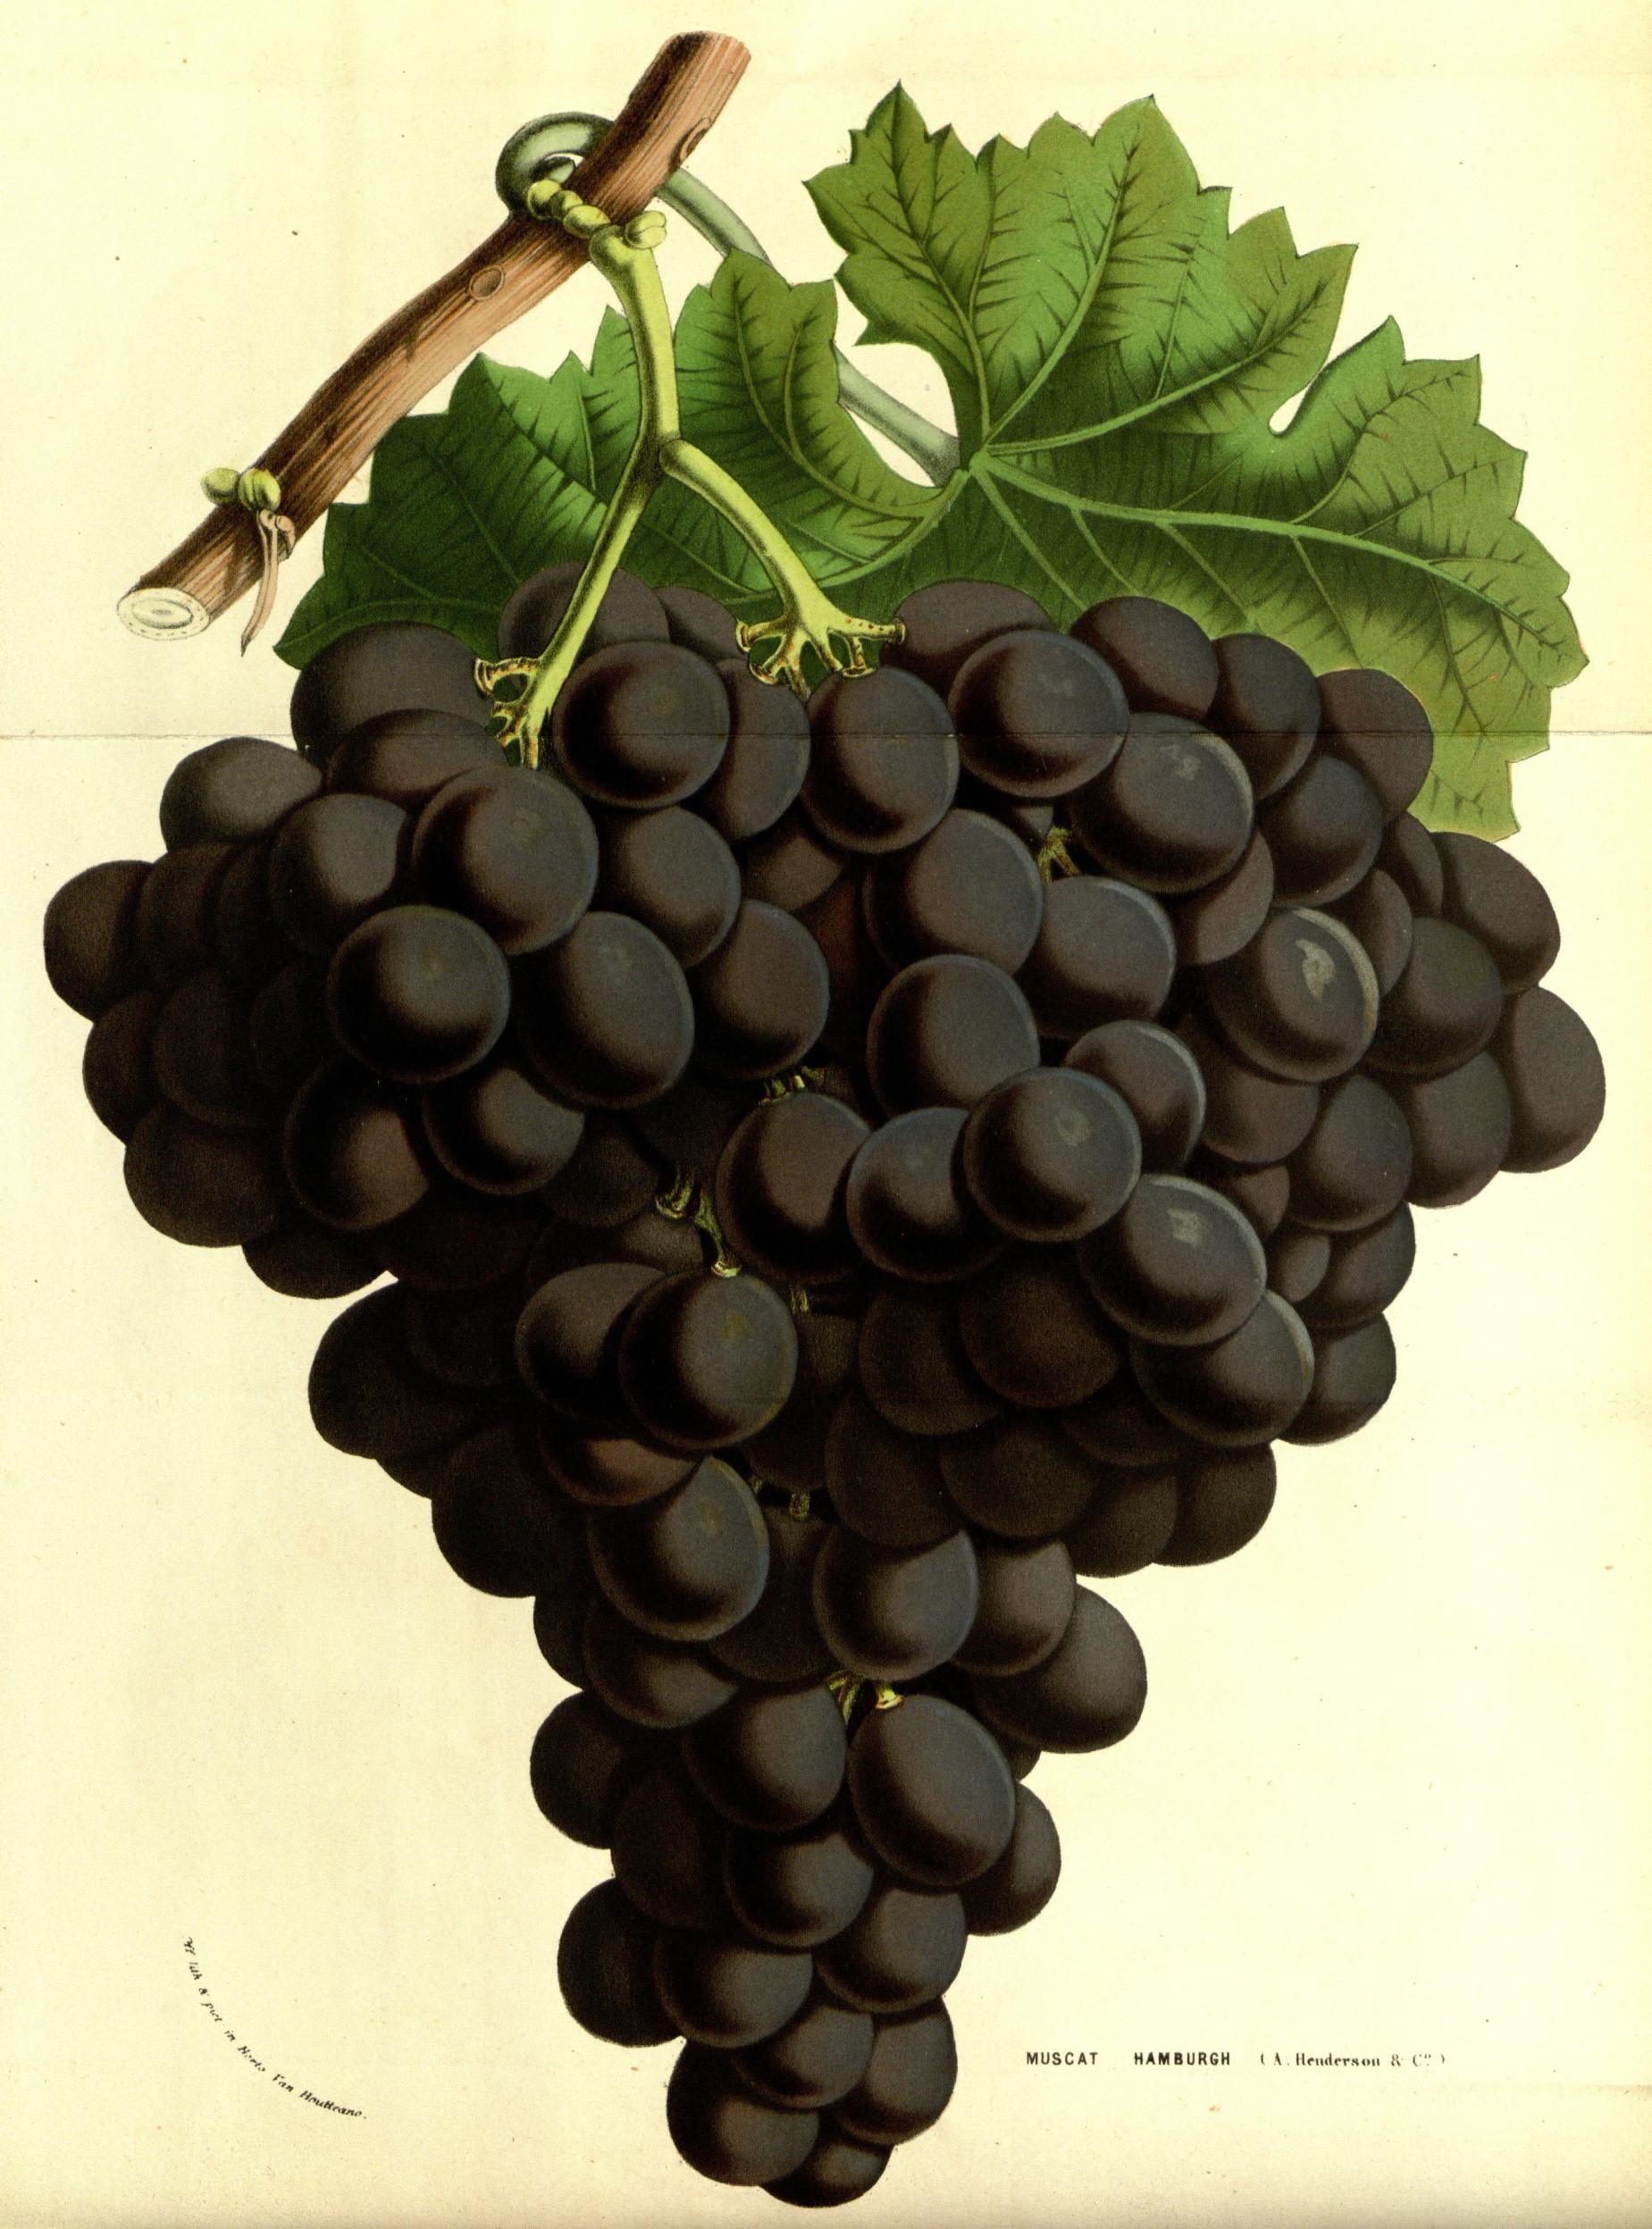 Muscat Hambourg - v.13 (1858) - Flore des serres et des jardins de l'Europe - Biodiversity Heritage Library